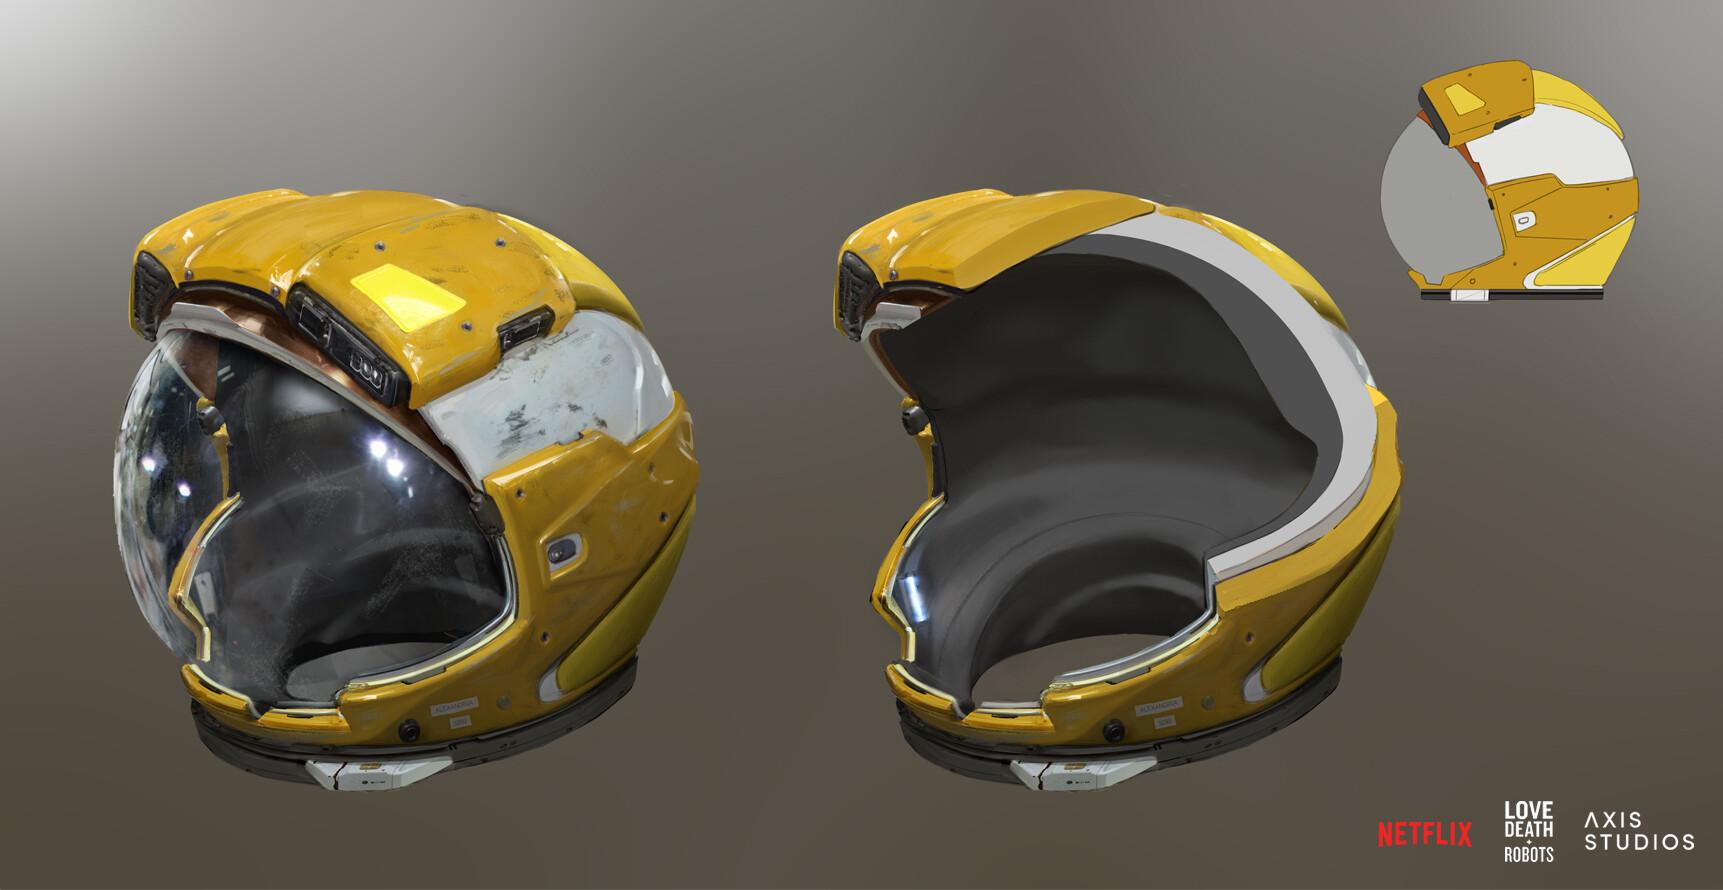 Bram sels hhd character design02 bram sels